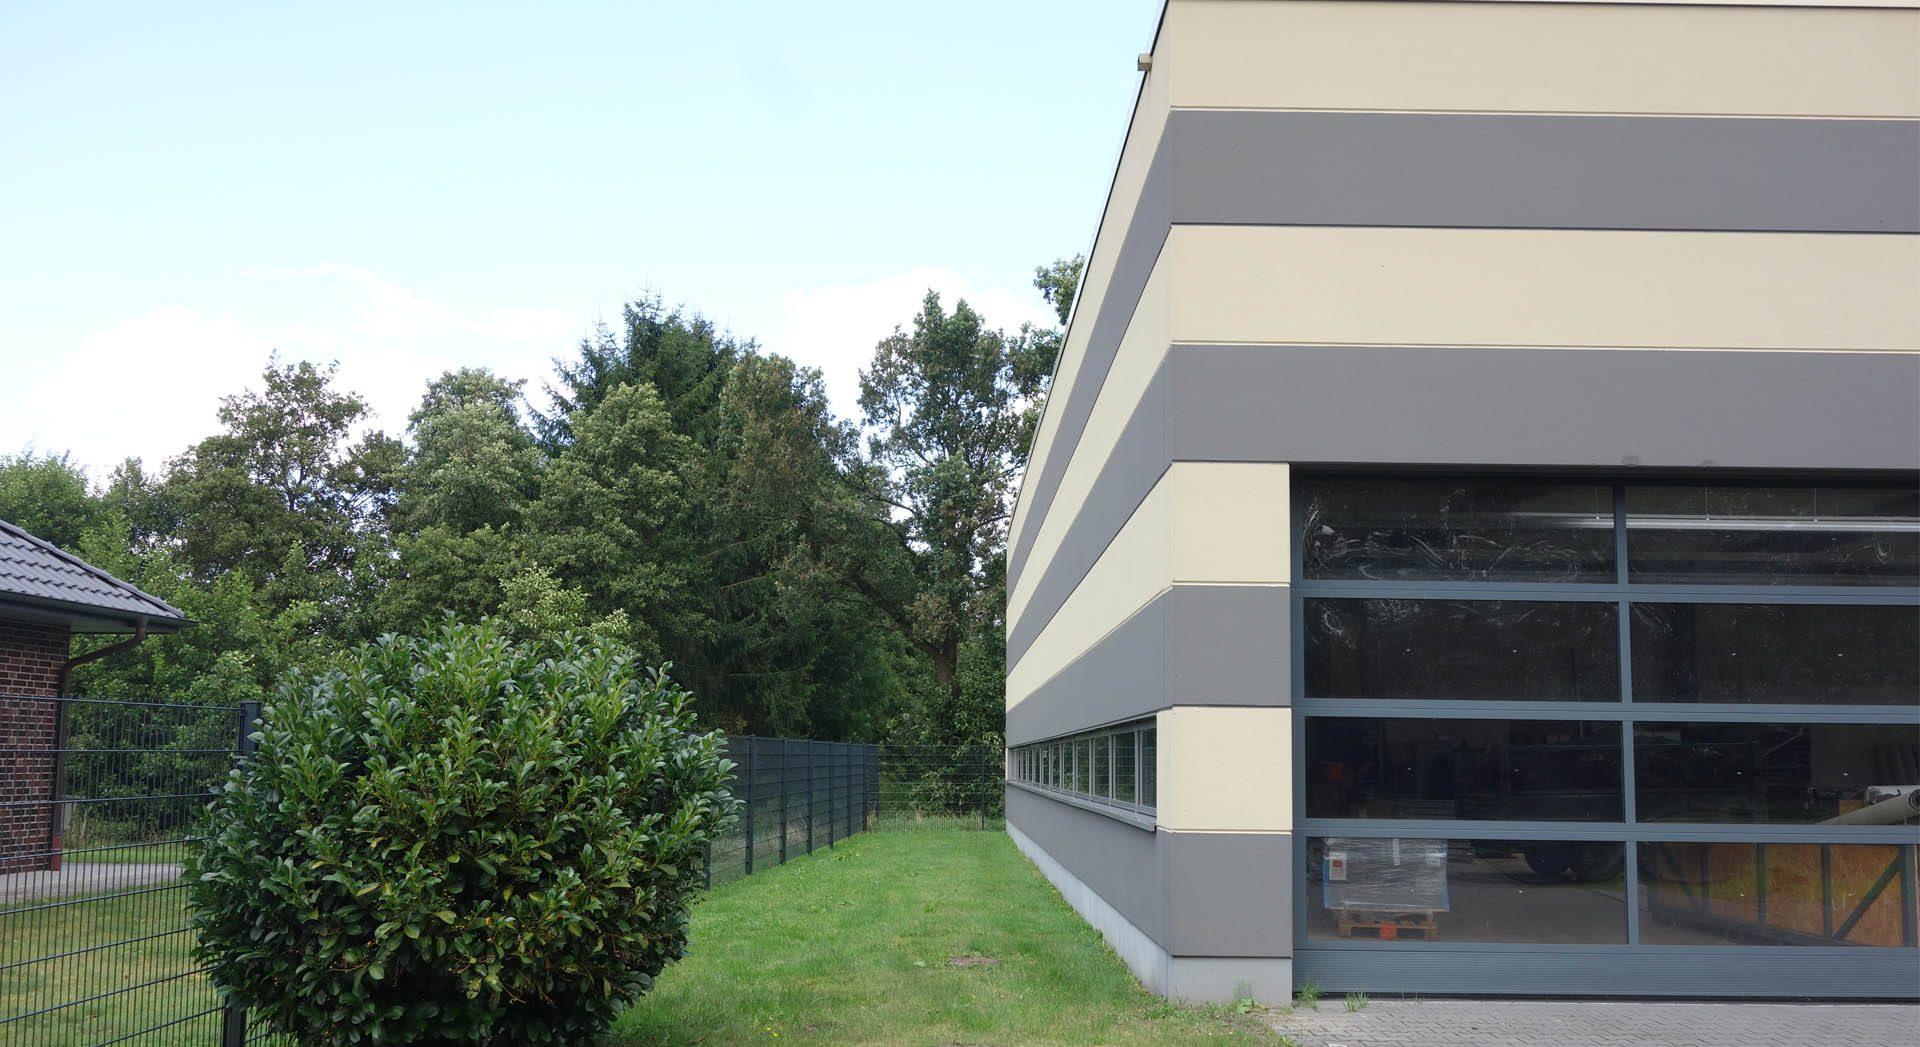 Gewerbearchitektur; Gewerbebau; Porenbeton; Lagerhalle; Architektur; Neubau;